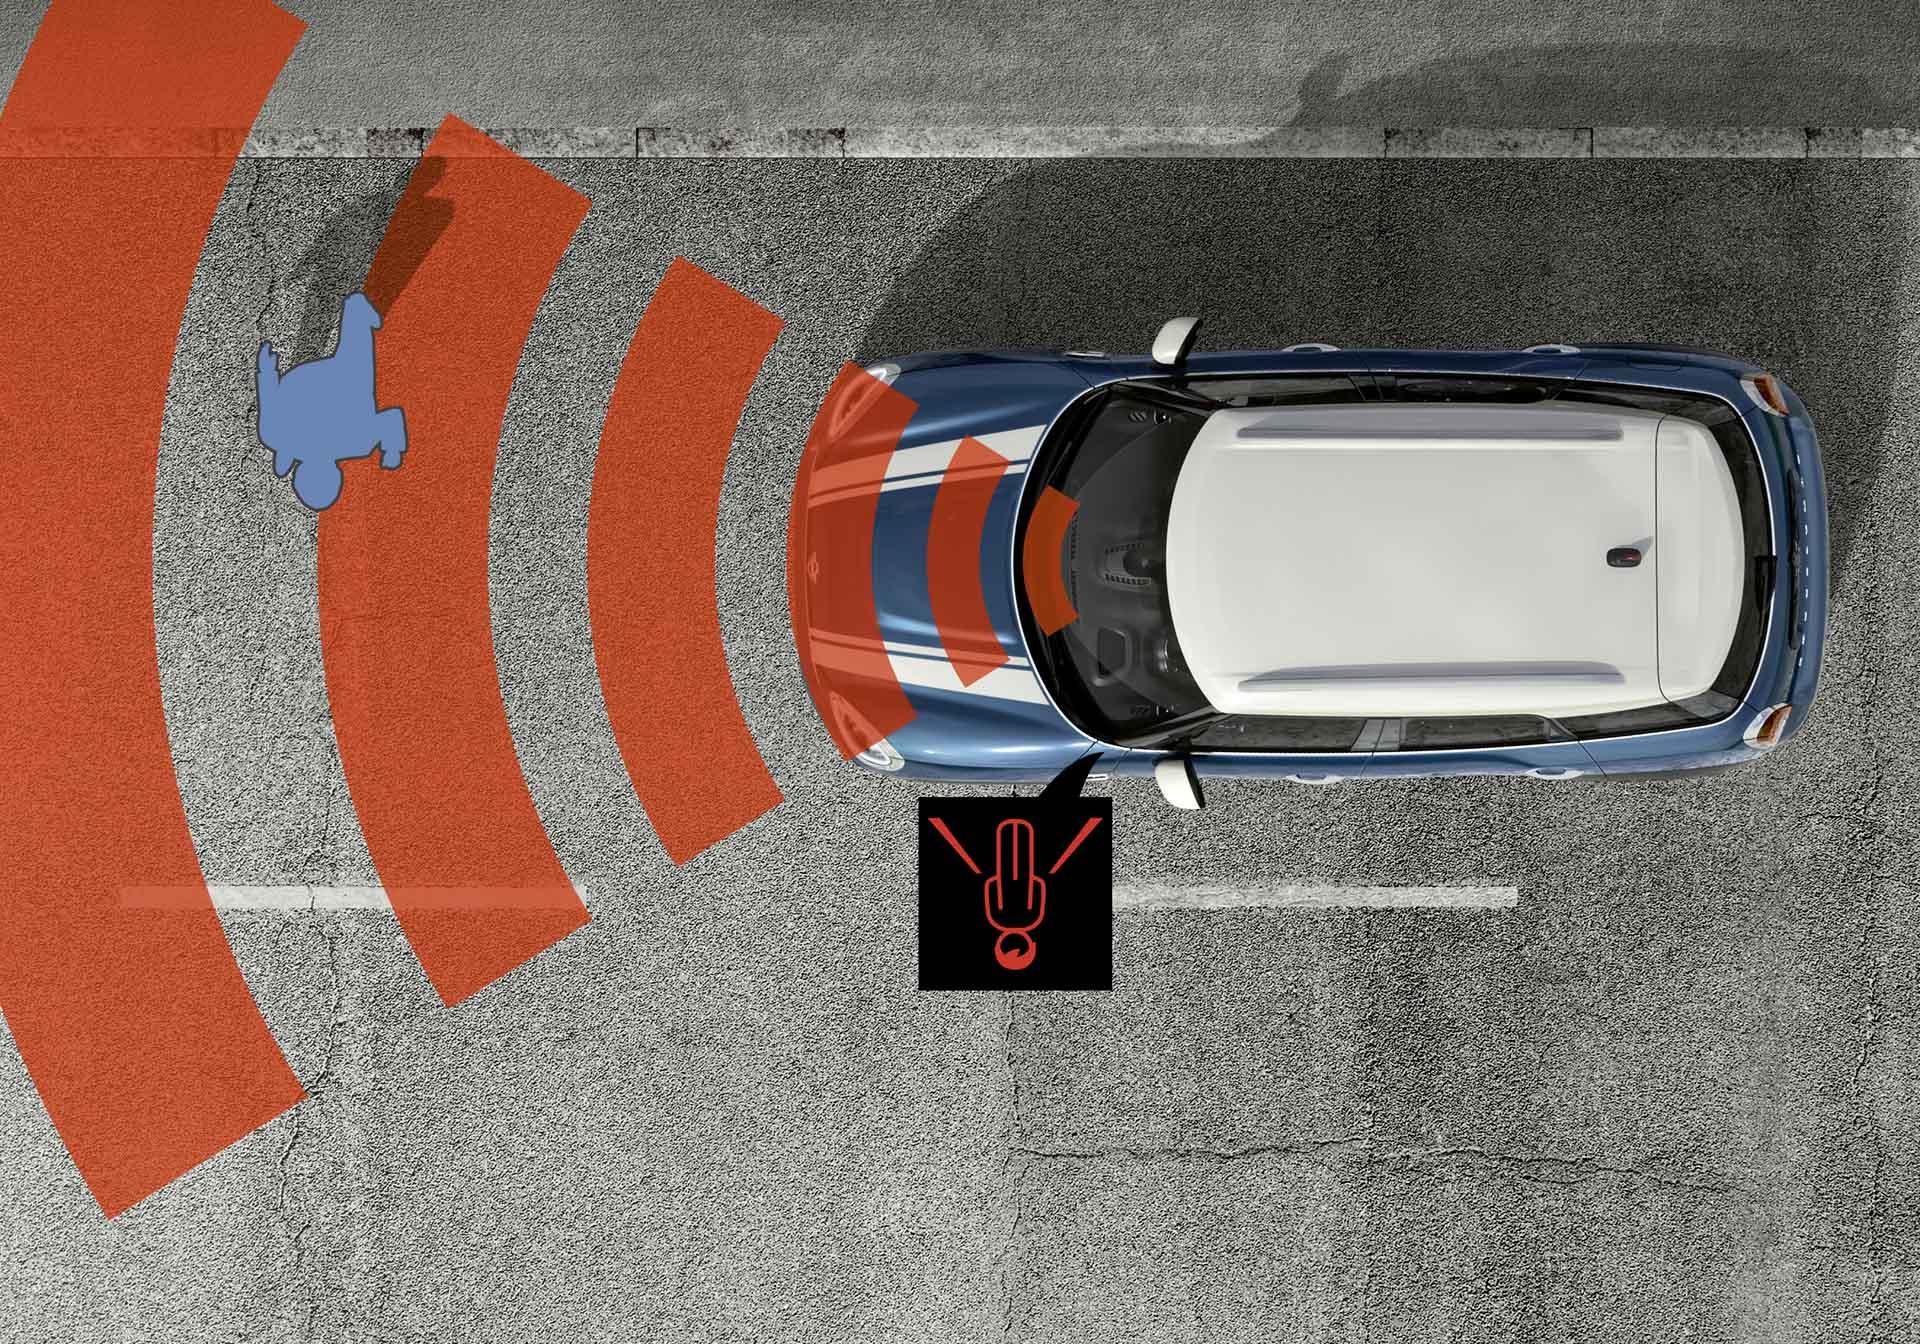 MINI Countryman Deluxe豪華野營版標準配備碰撞預警系統